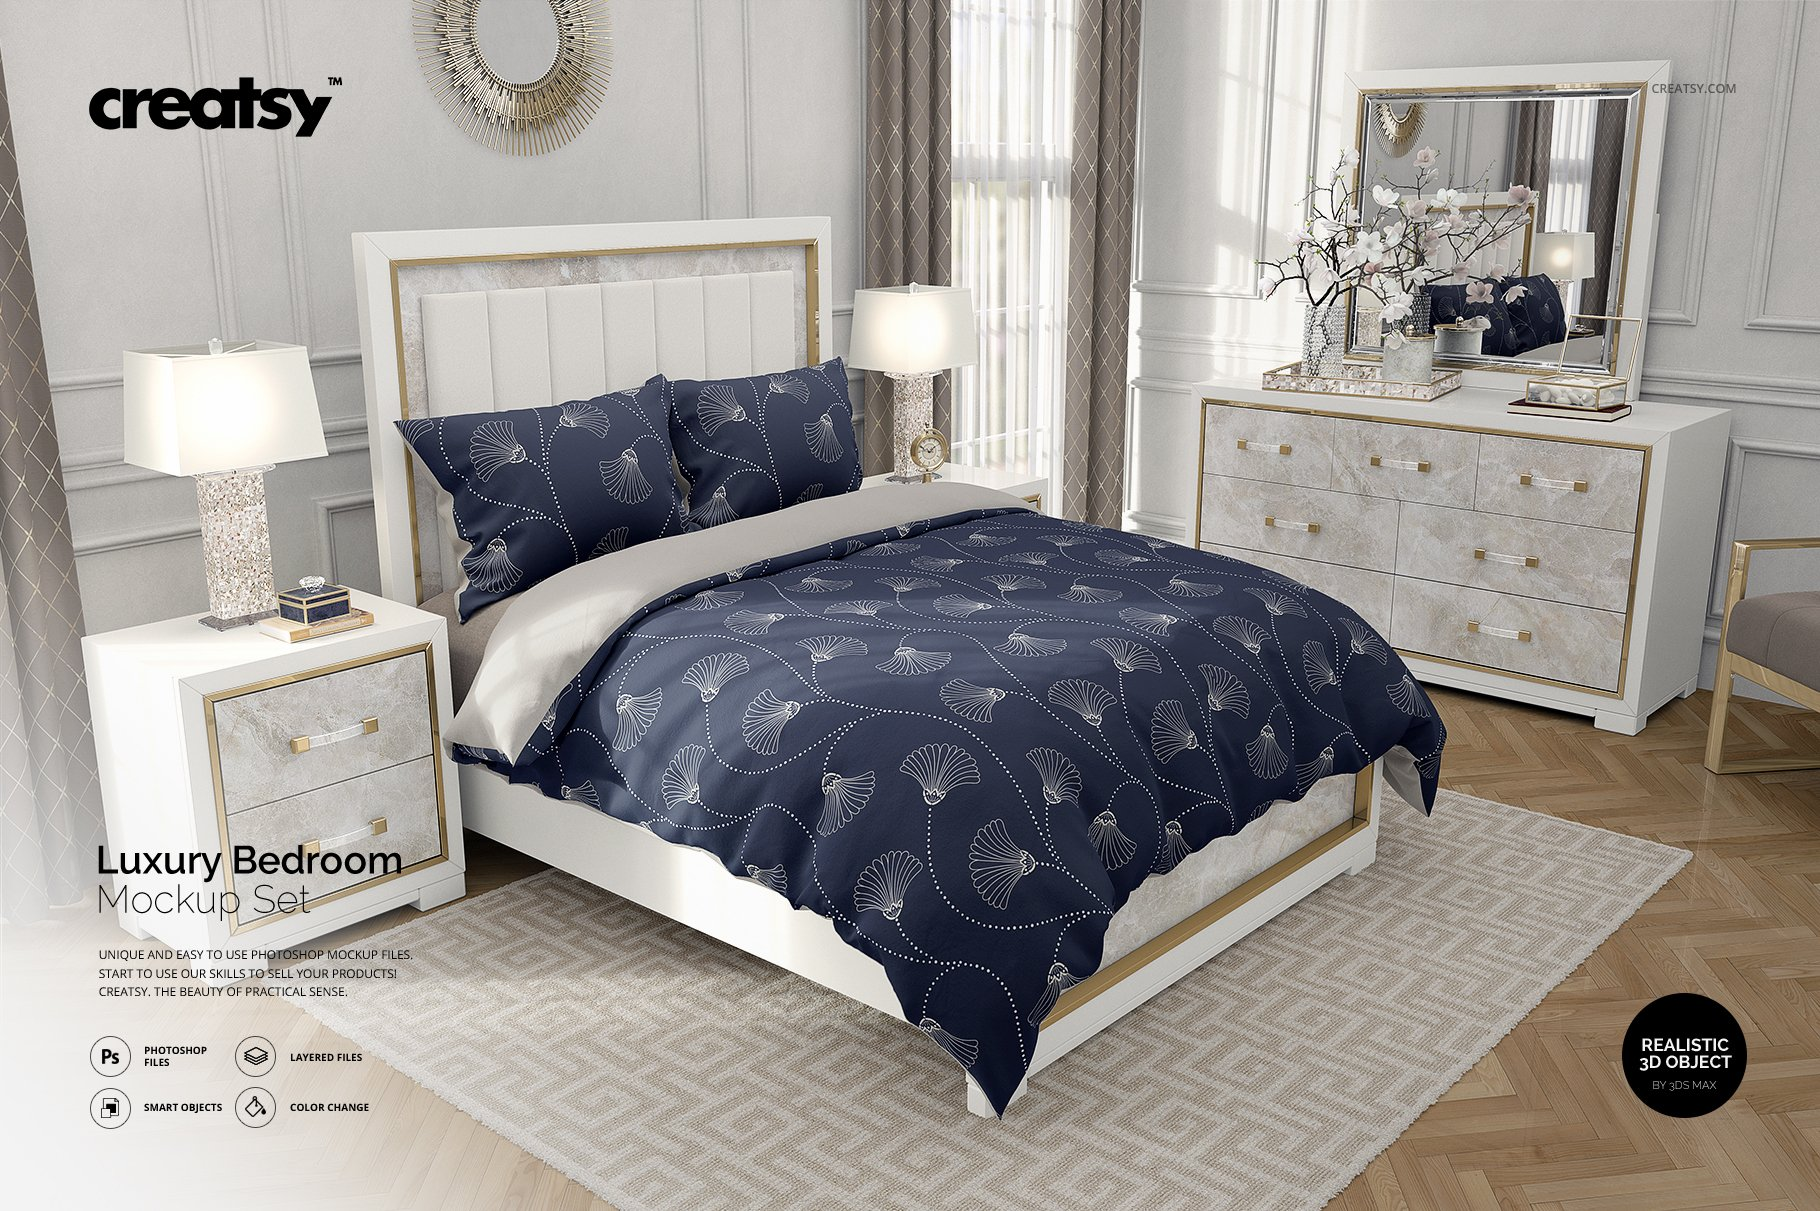 Luxury Bedroom Bedding Mockup Set Creative Photoshop Templates Creative Market